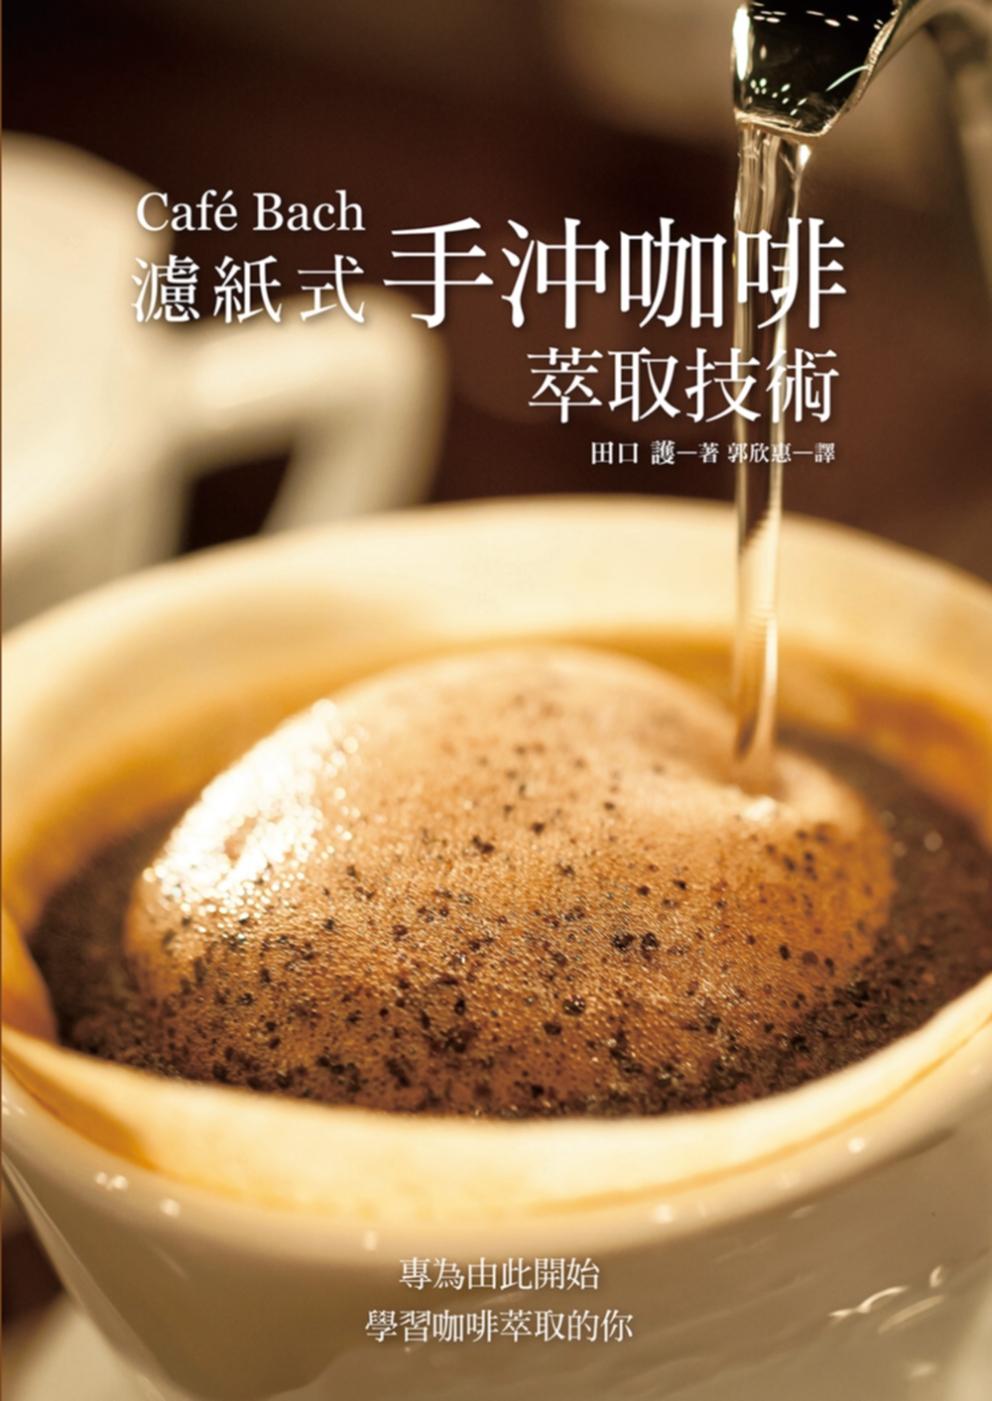 Café Bach 濾紙式手沖咖啡萃取技術:咖啡之神田口護,淬鍊40年的手沖堅持^!